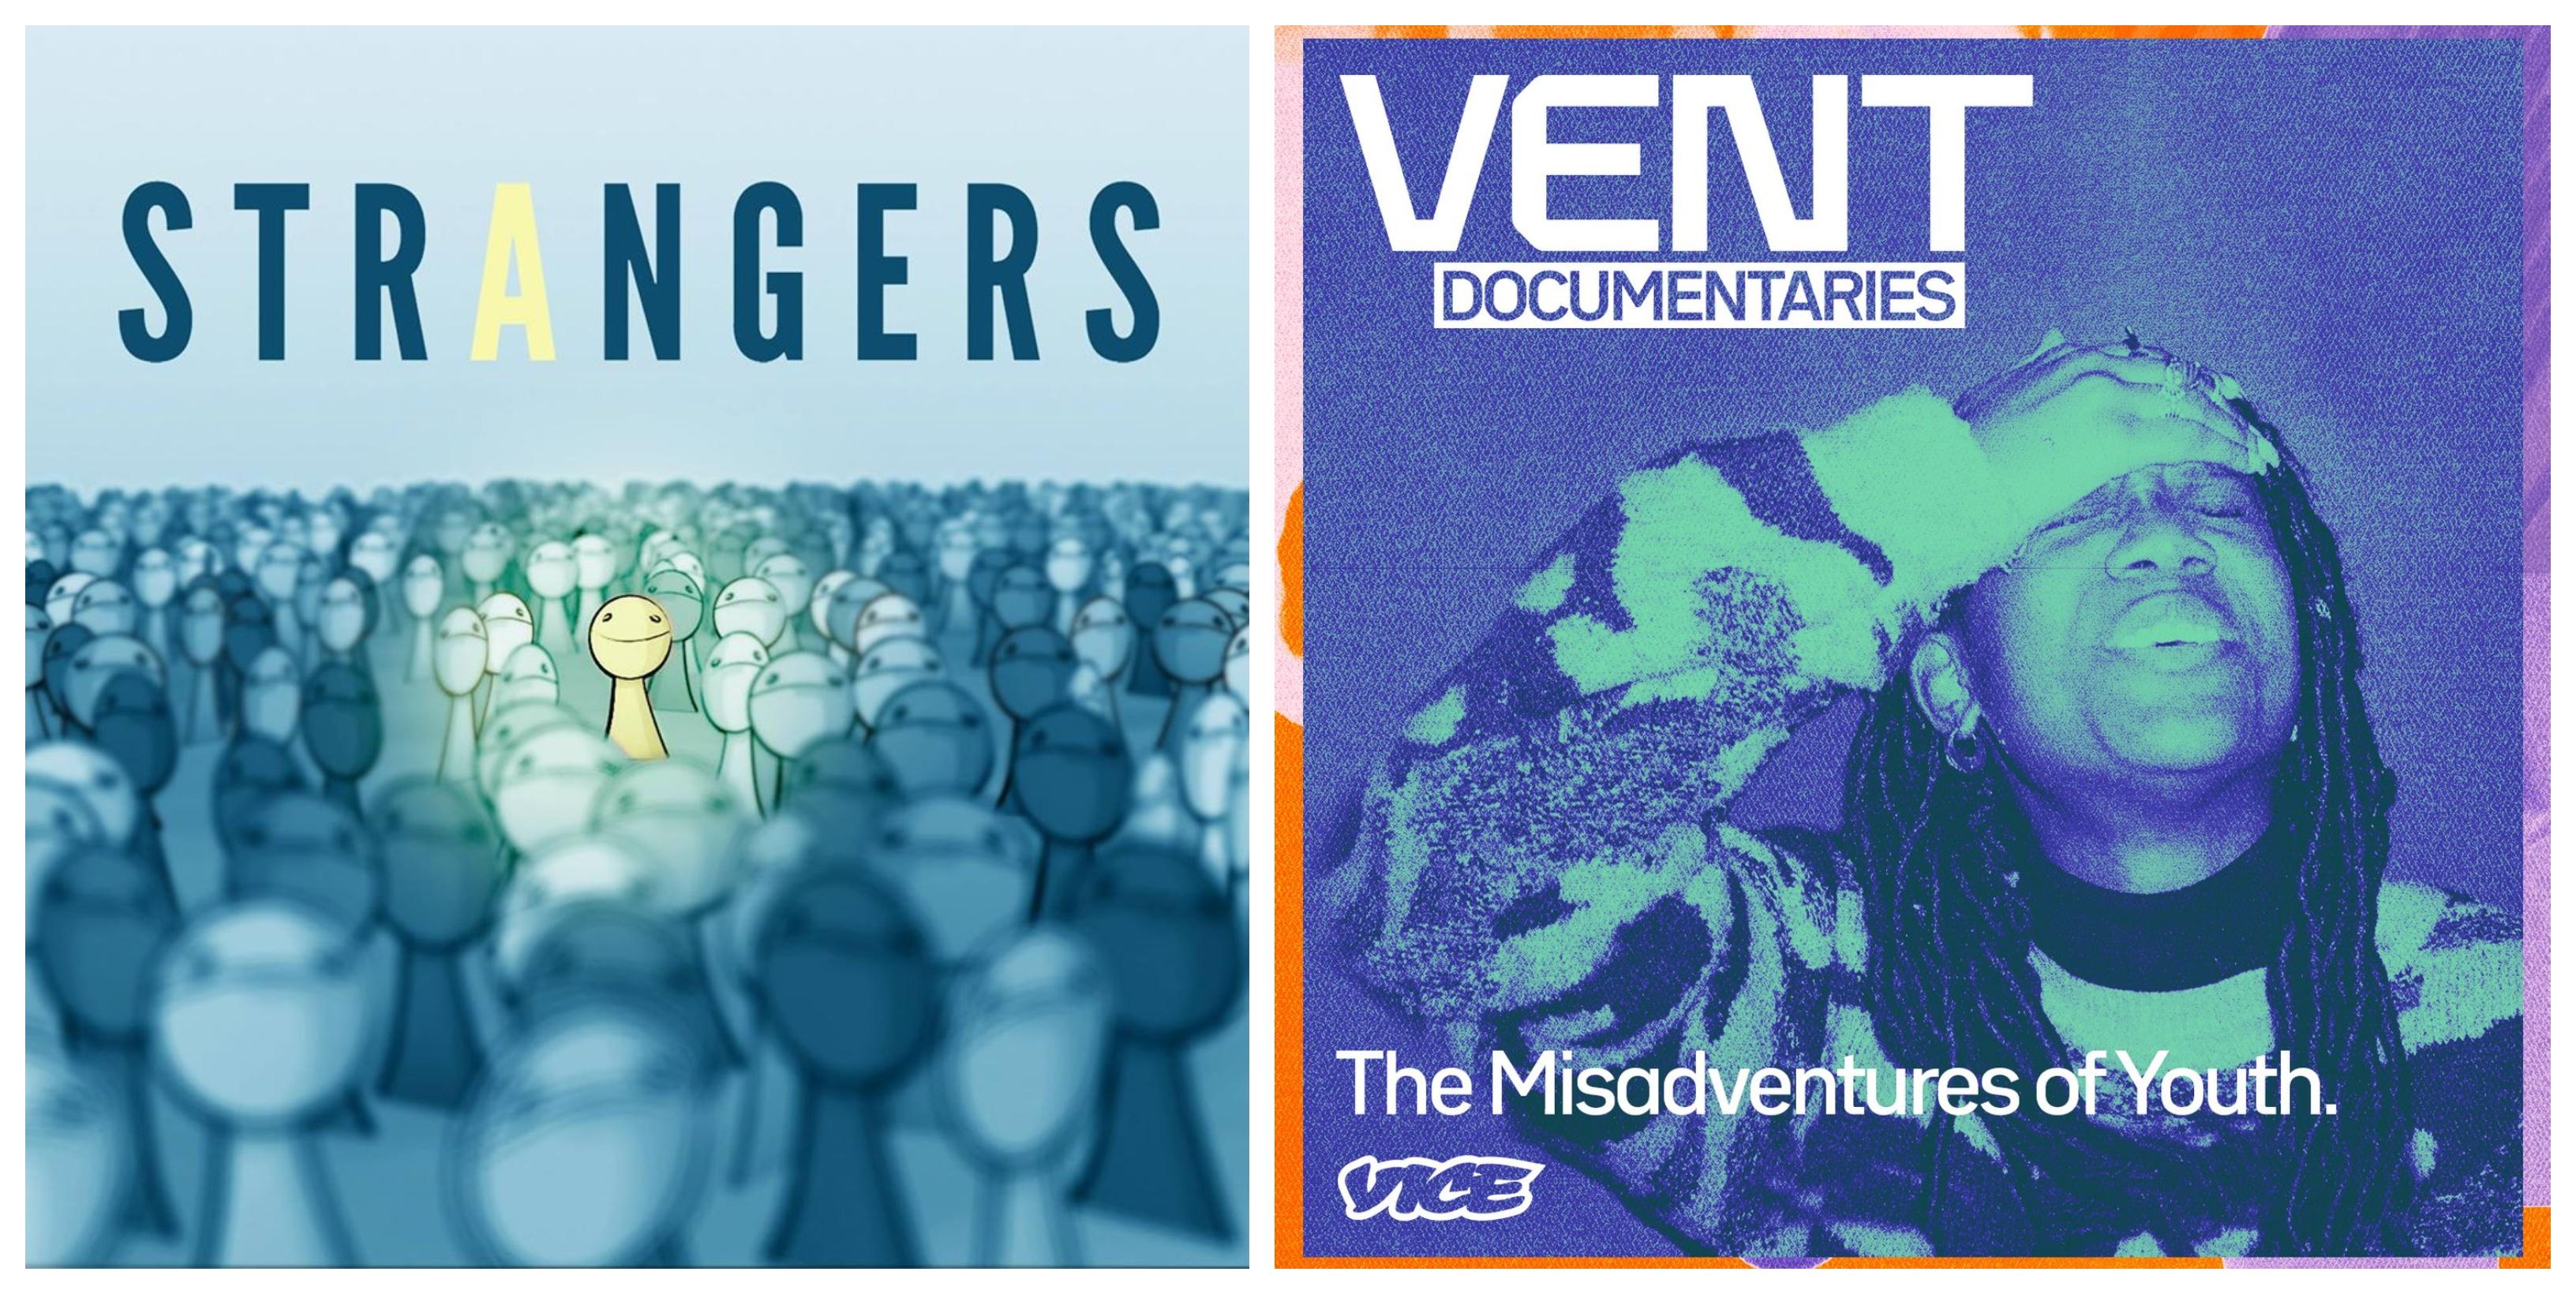 Strangers - VENT Documentaries